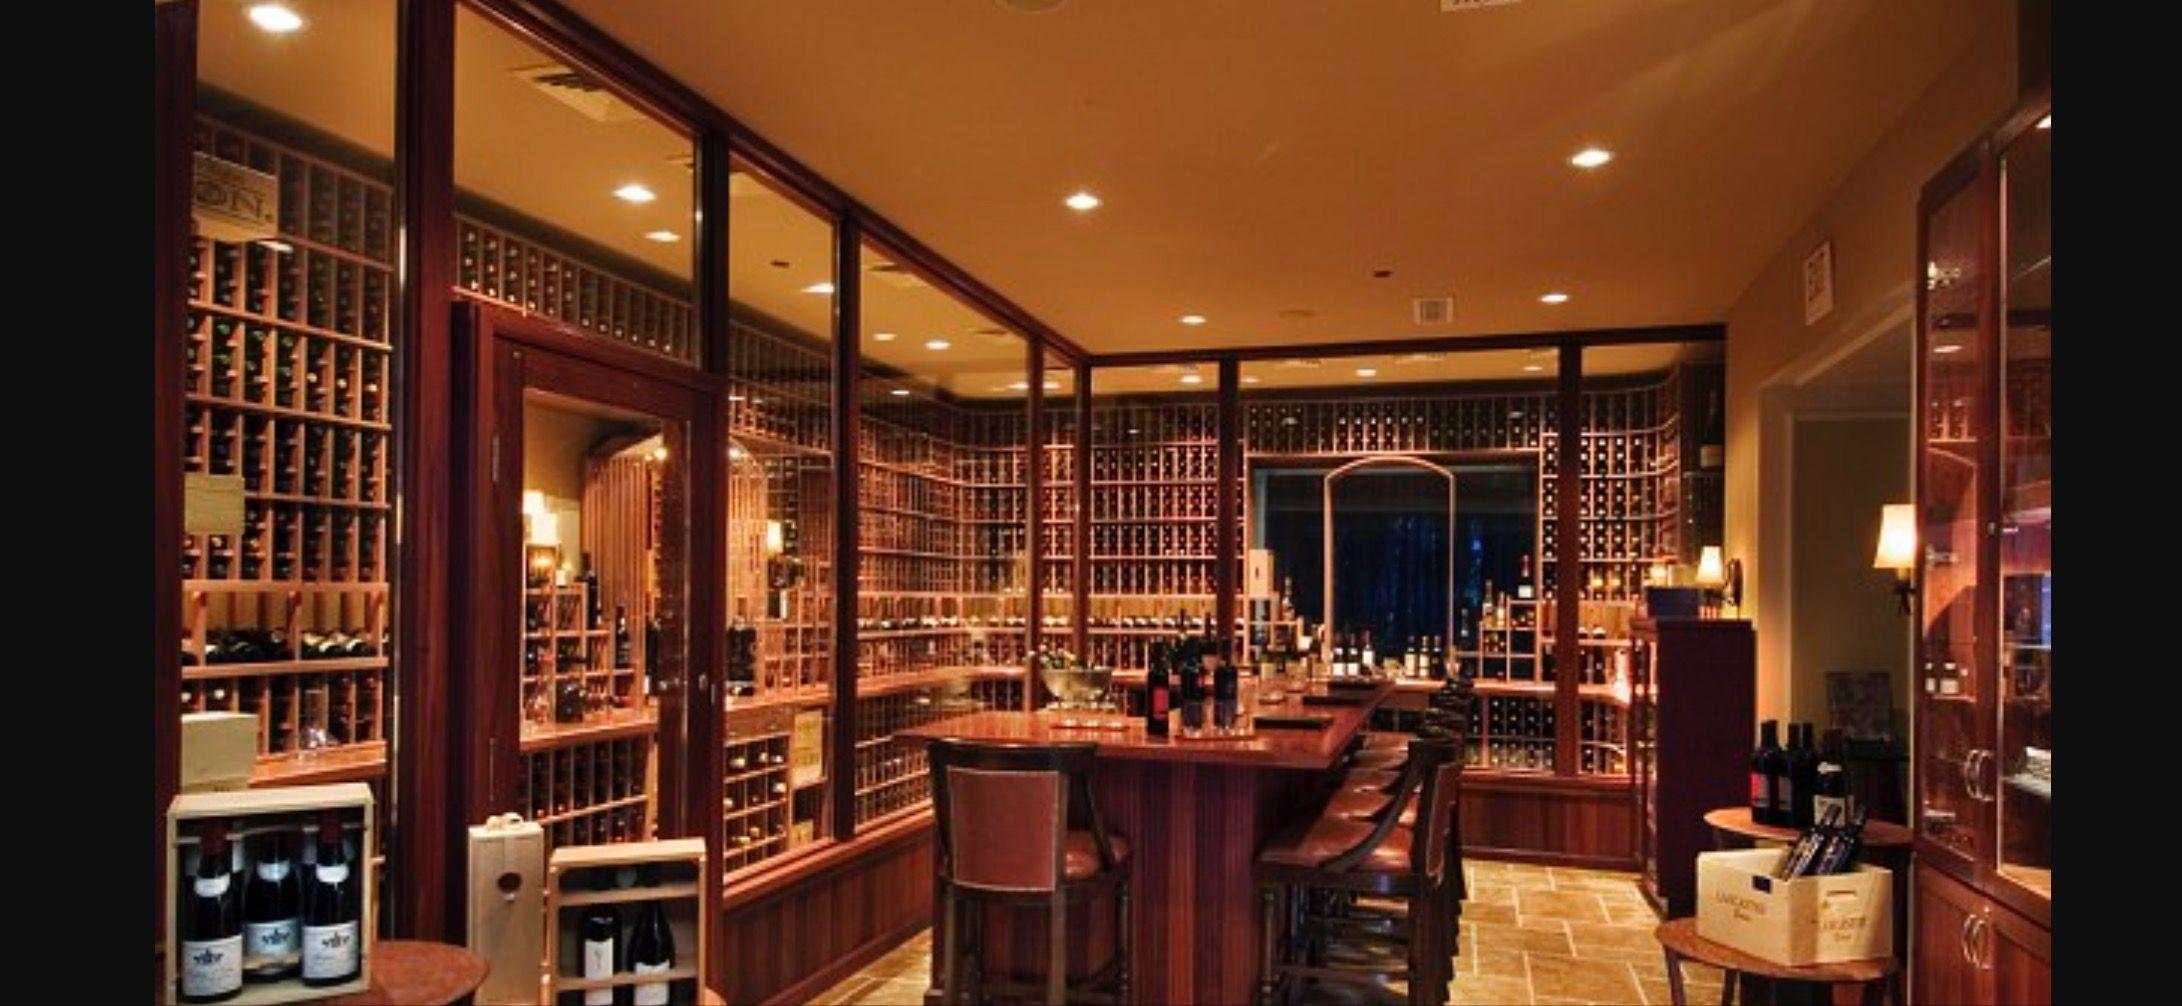 Wine Storage Ideas, Wine Cellar Ideas, Wooden Wine Racks, Wine